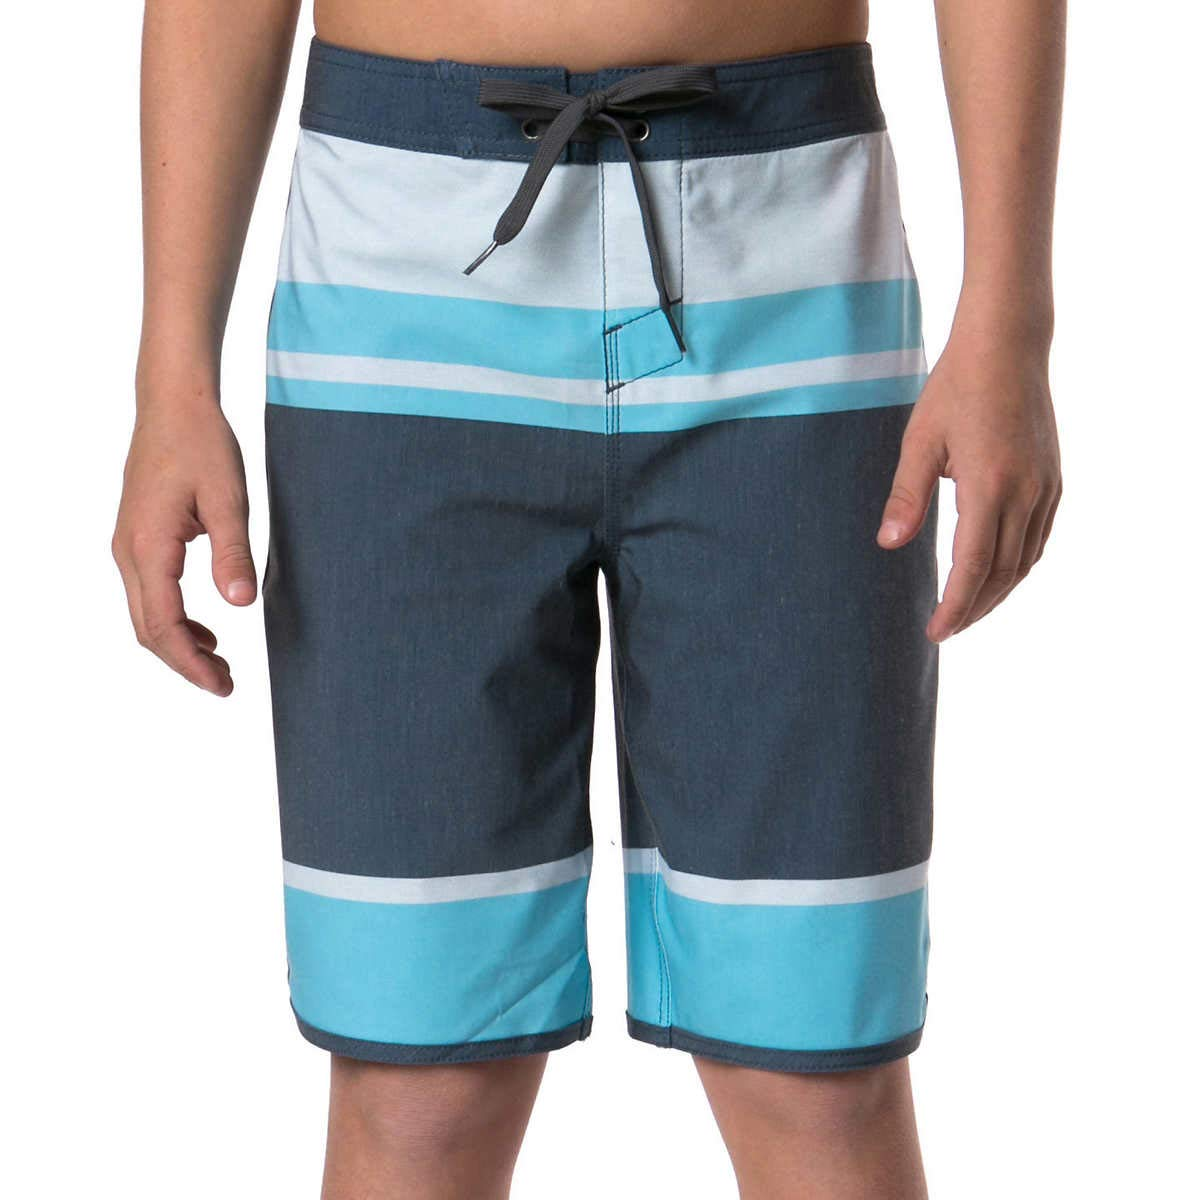 Hang Ten Boys' Youth Boardshort